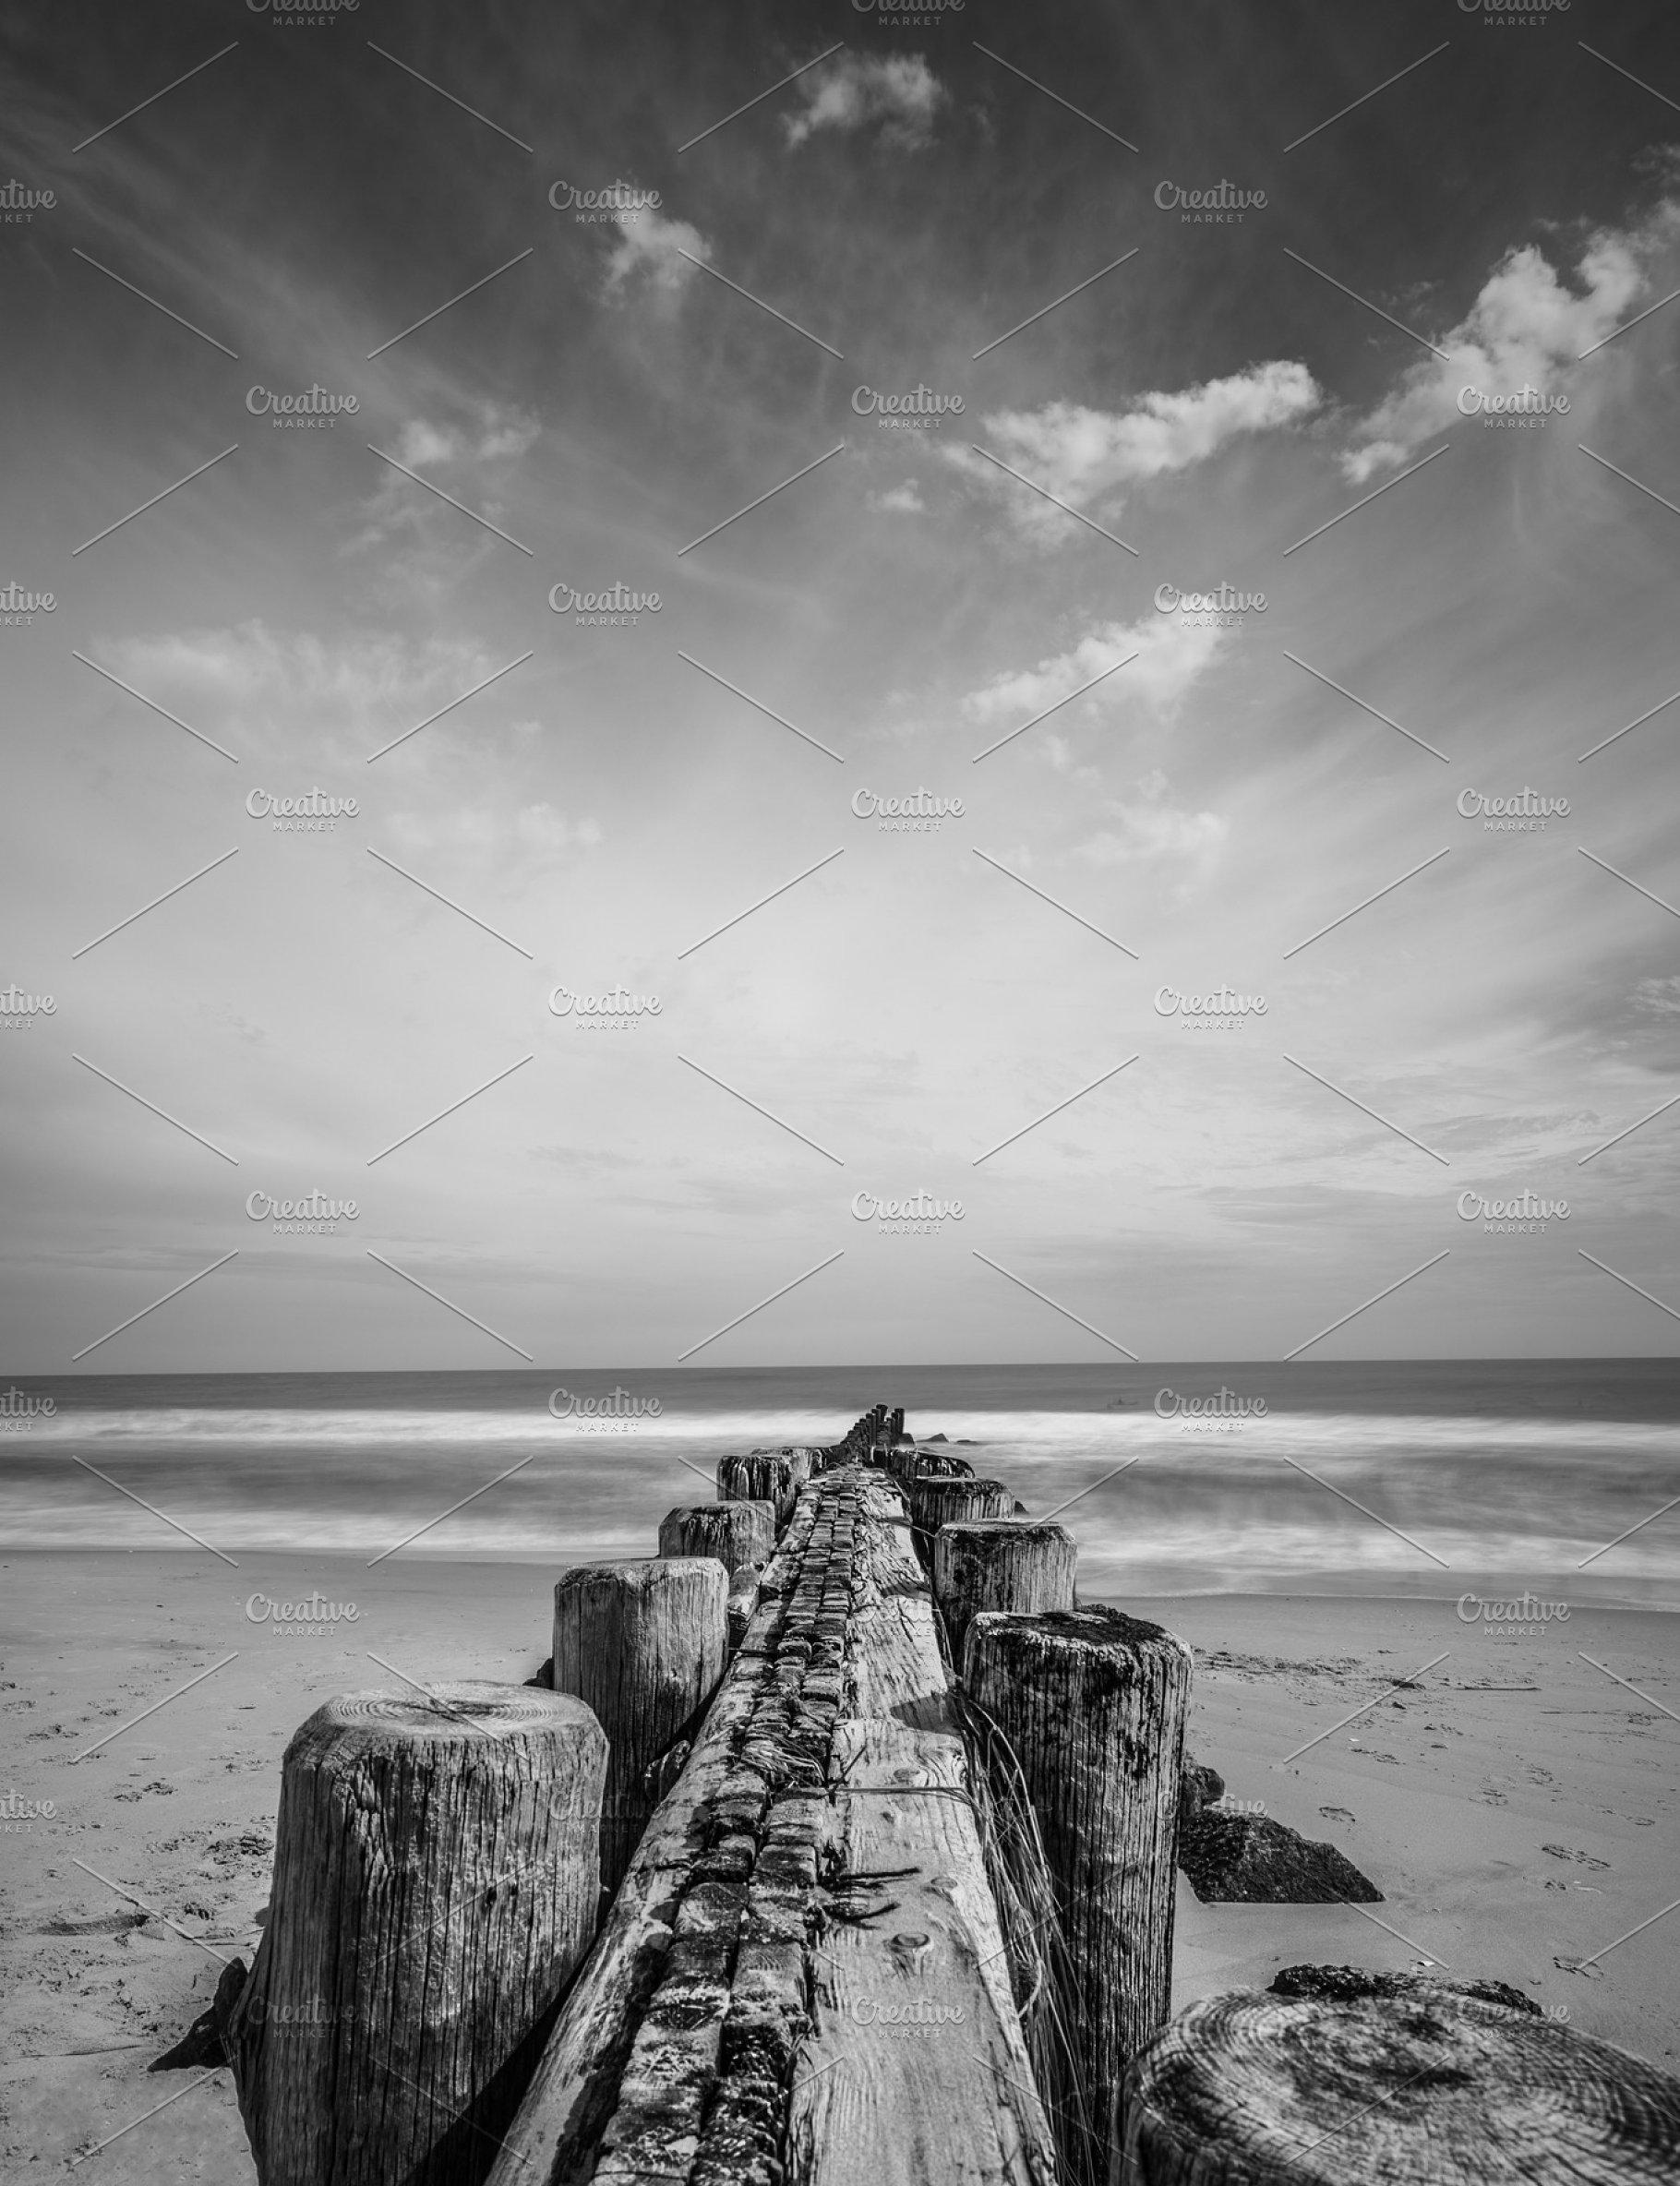 Jersey shore seascape